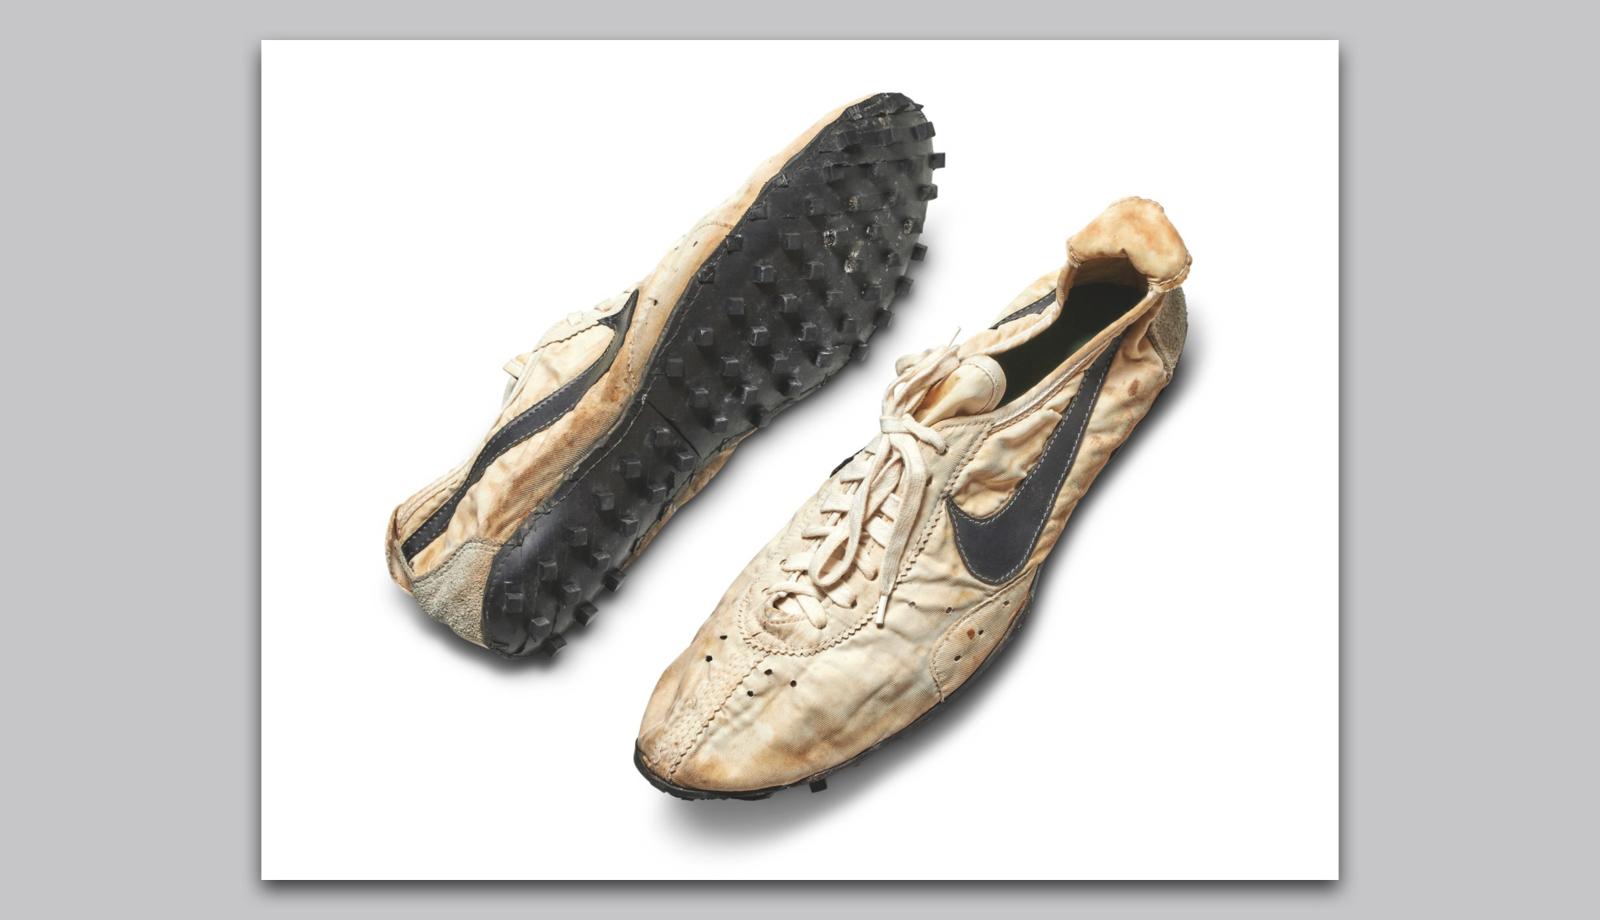 190724_Designkritik_ReneSpitz_WDR3-Resonanzen_Sneaker